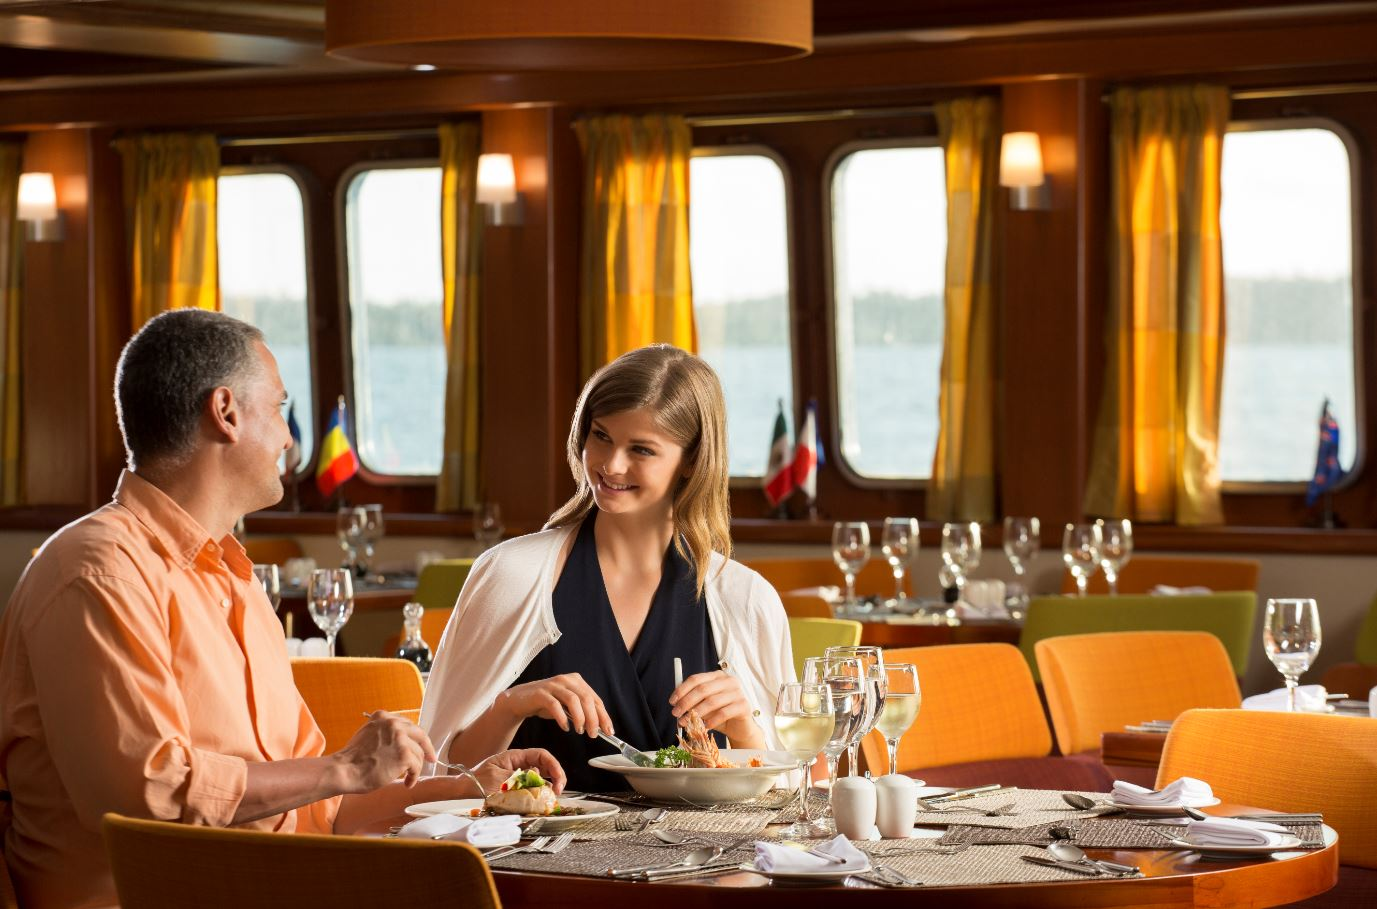 Restaurant at Santa Cruz II Galapagos Cruise.